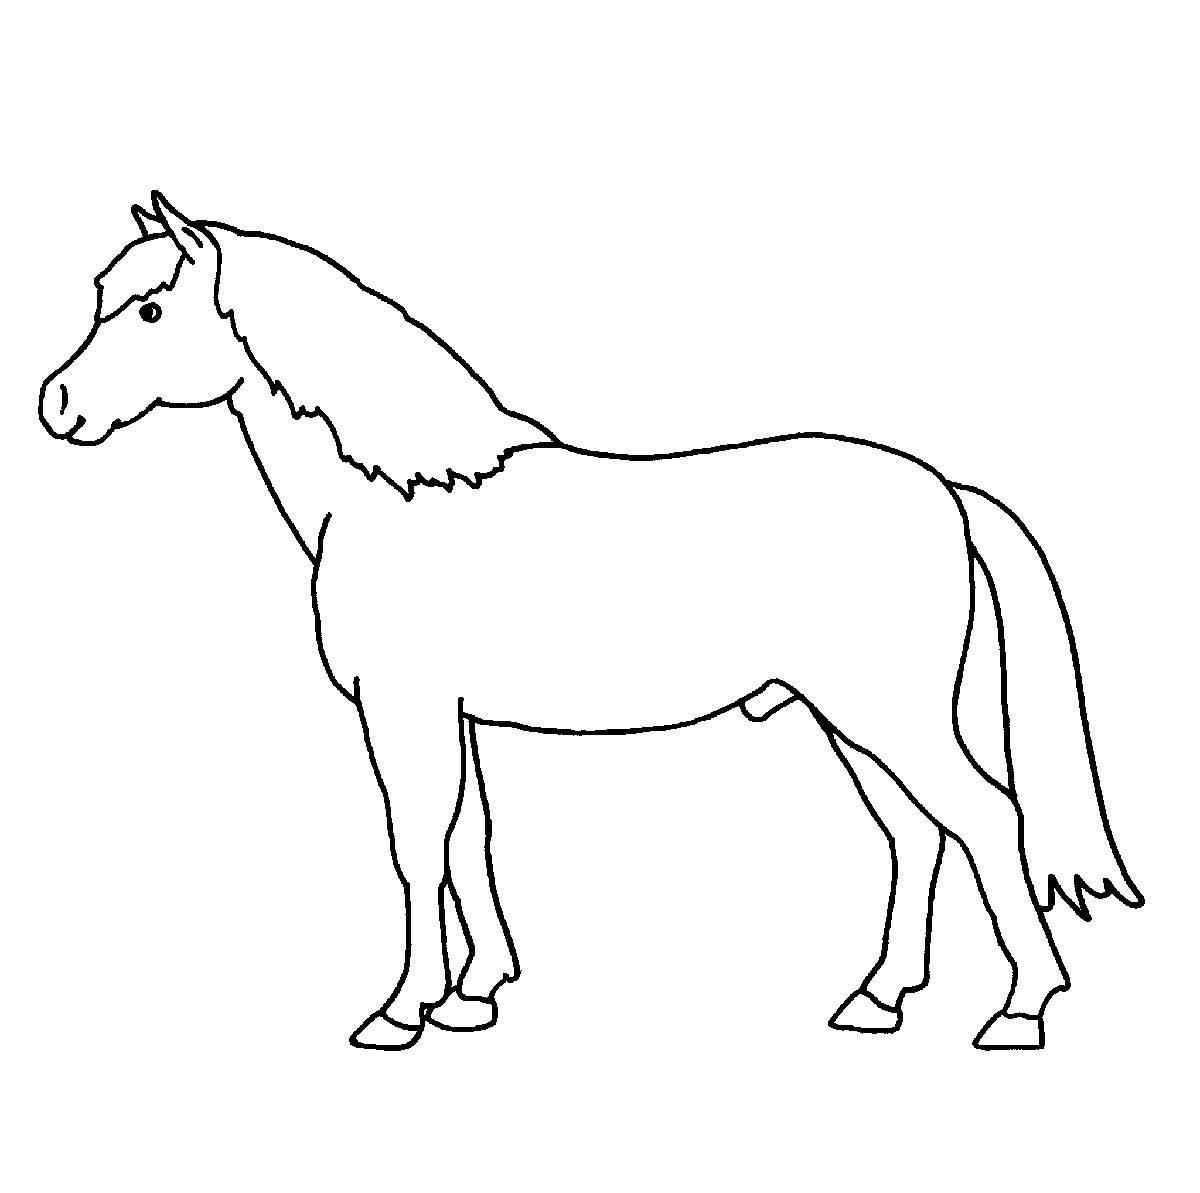 Ausmalbild Bauernhof Ausmalbild Pferd Kostenlos Ausdrucken